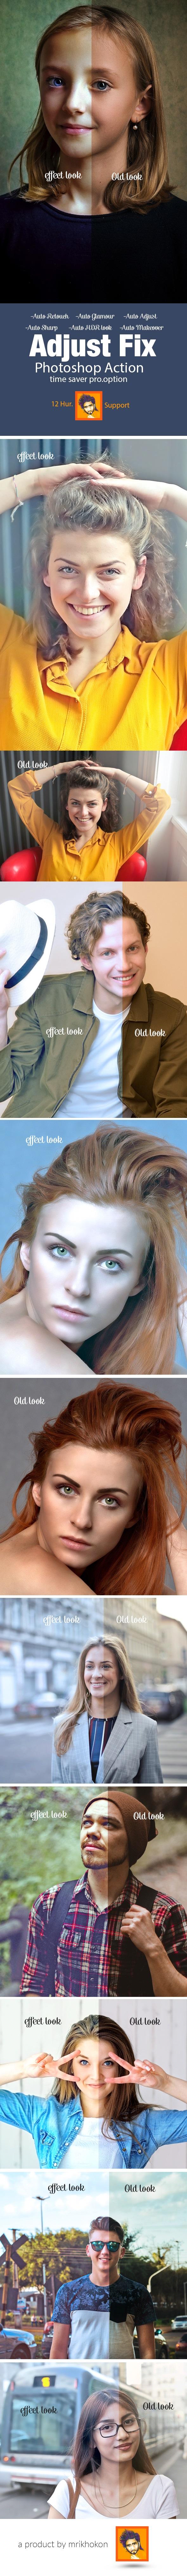 Adjust Fix Photoshop Action - Photo Effects Actions